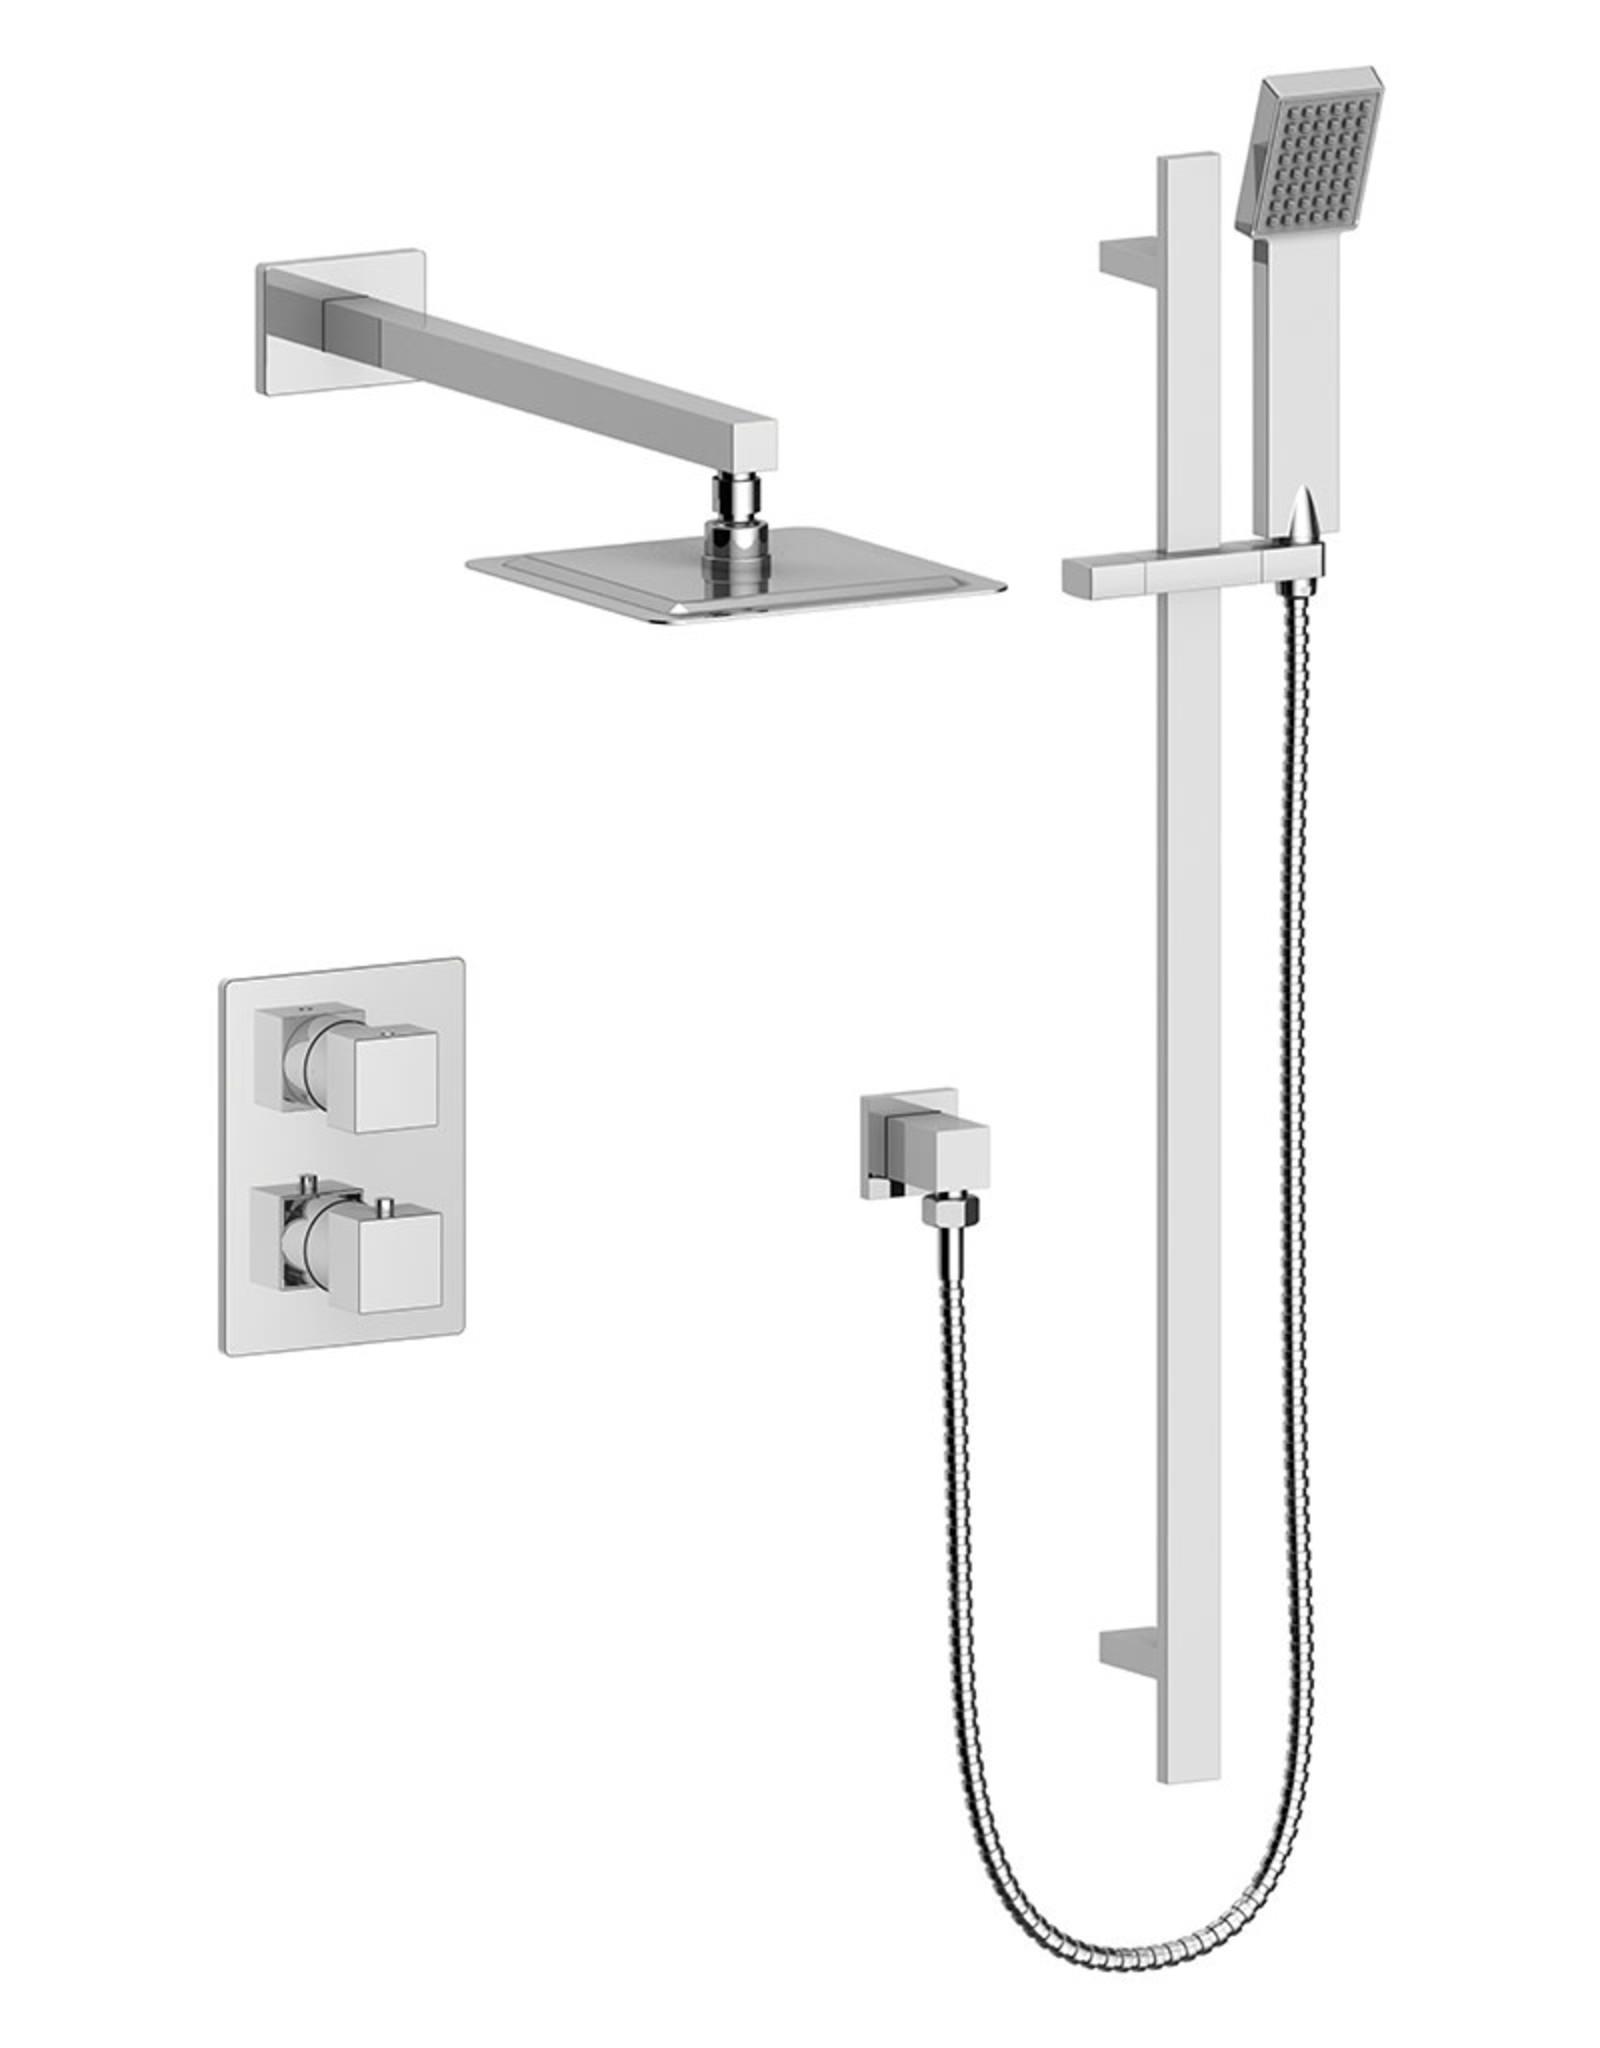 Vogt Kapfenberg- 2-Way Thermostatic Shower Kit NO SPOUT- Chrome